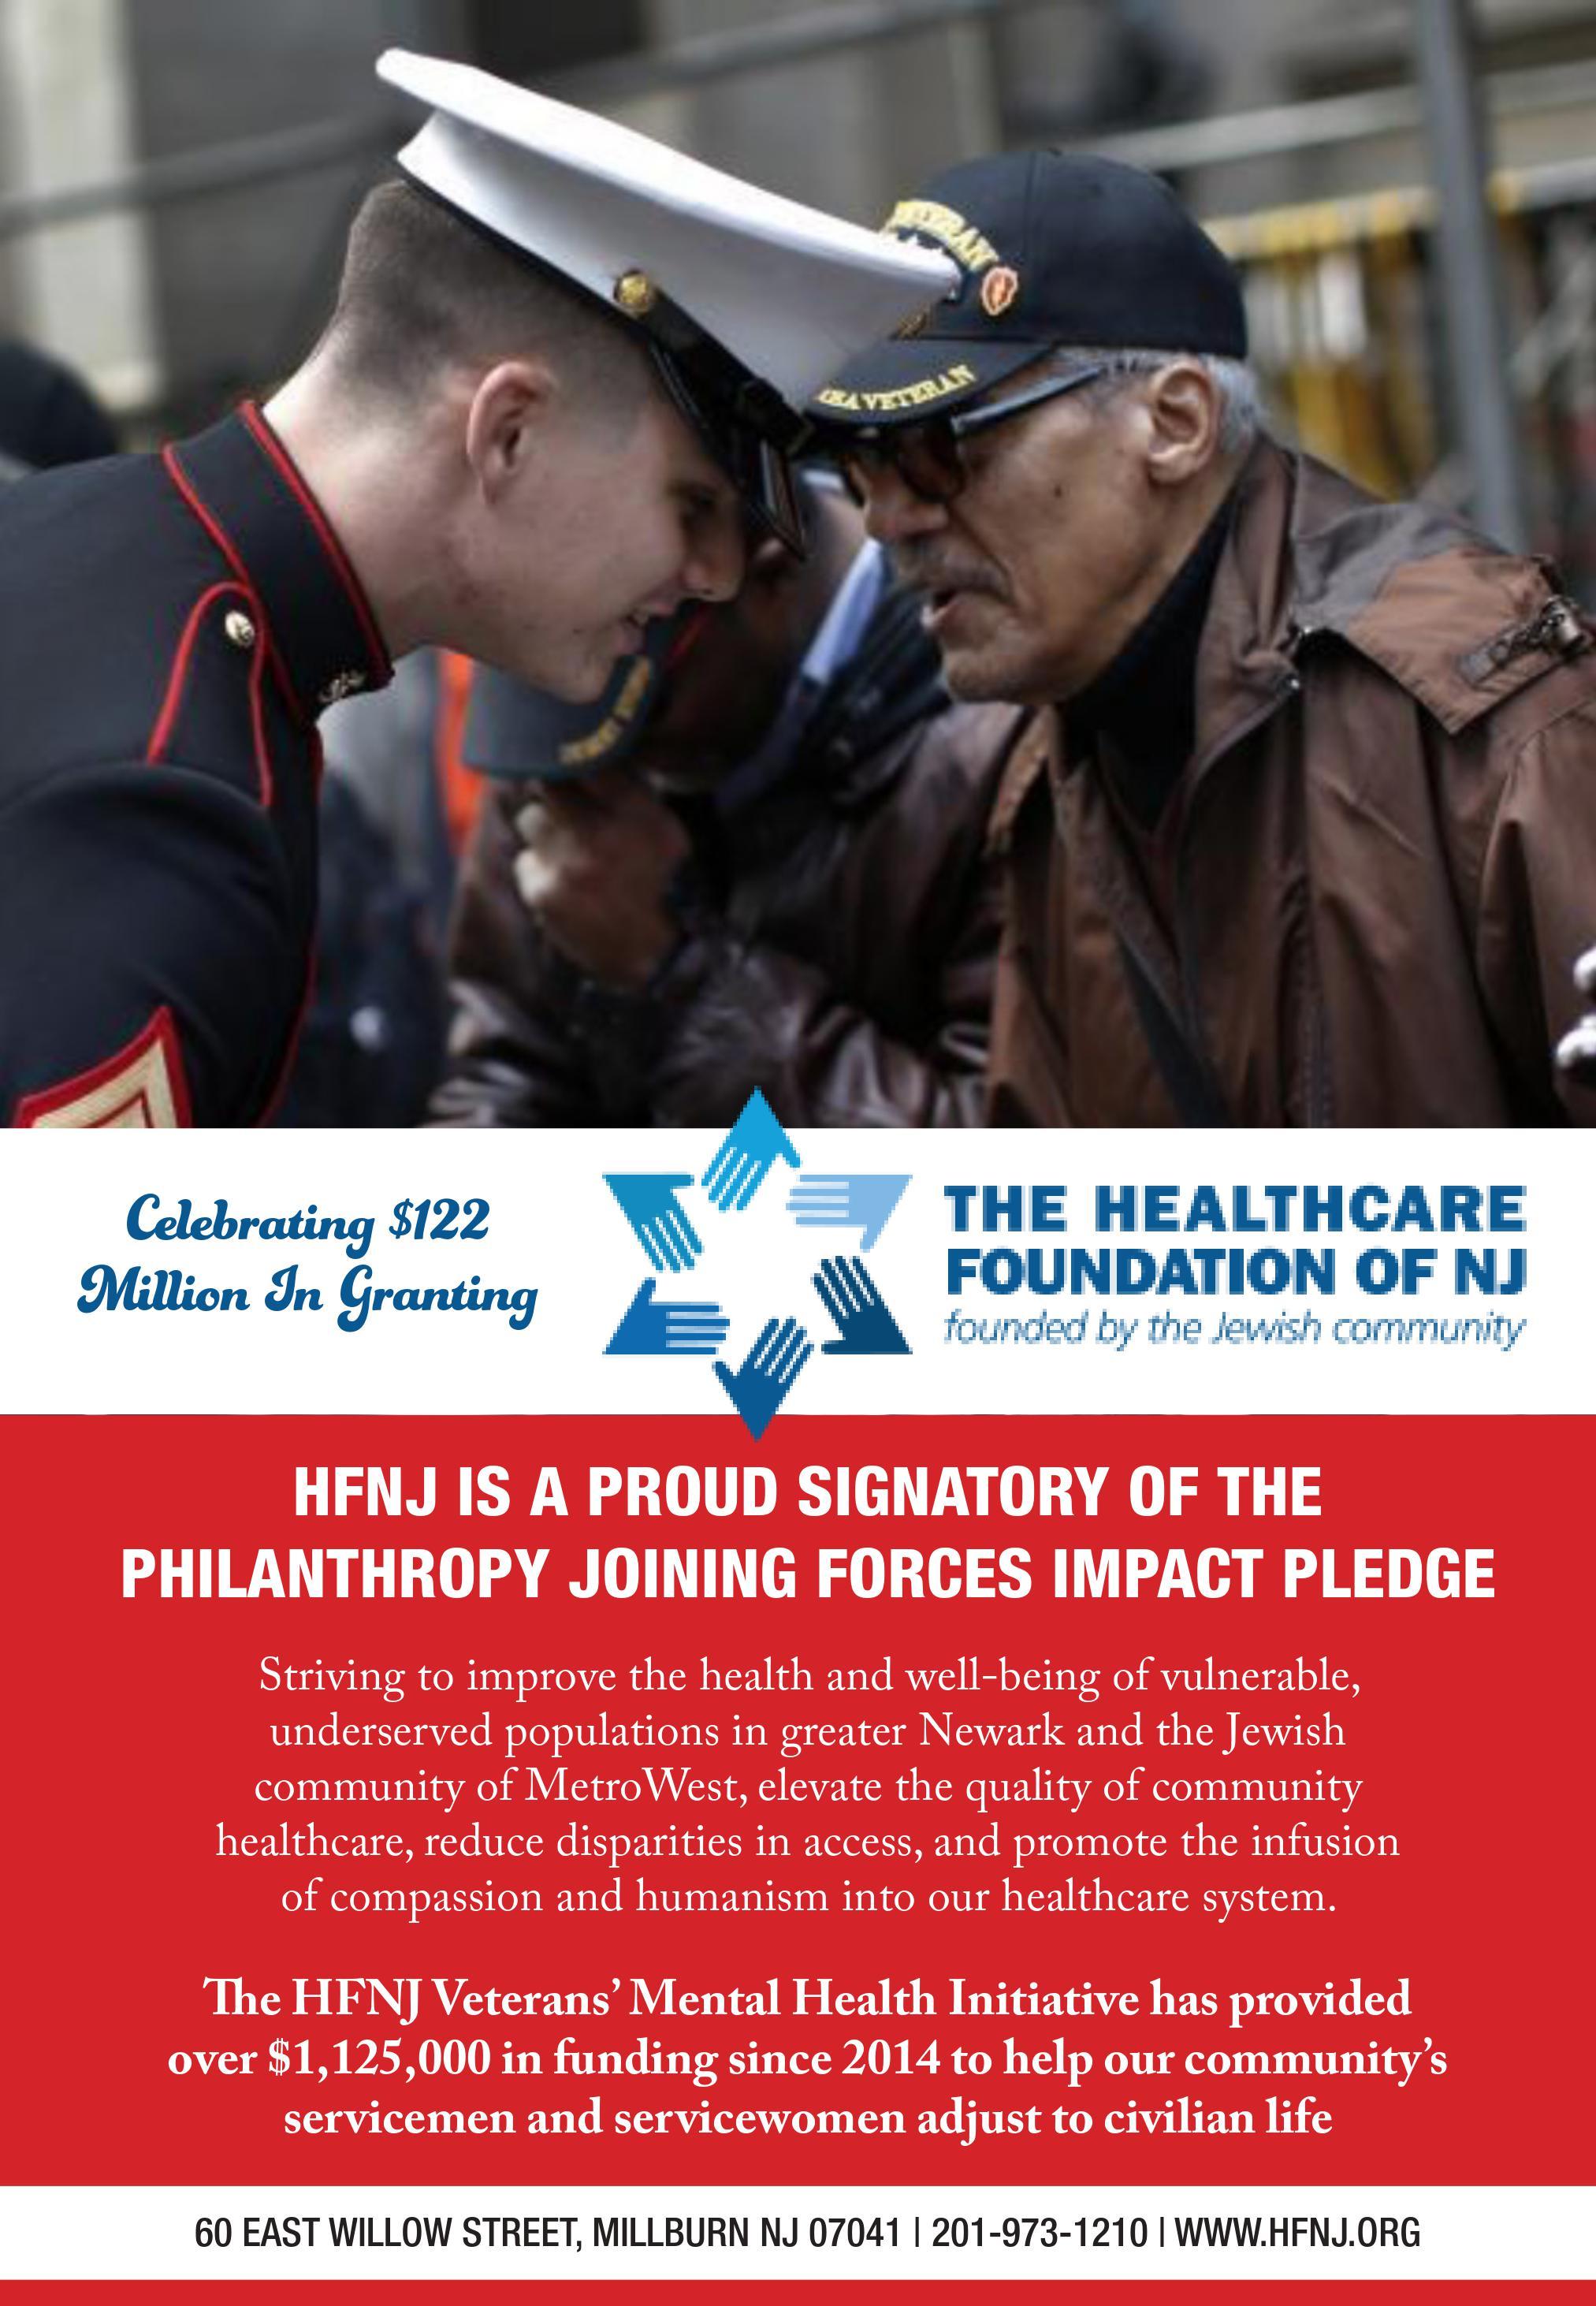 Hfnj Veteran S Mental Health Initiative Healthcare Foundation Of Nj